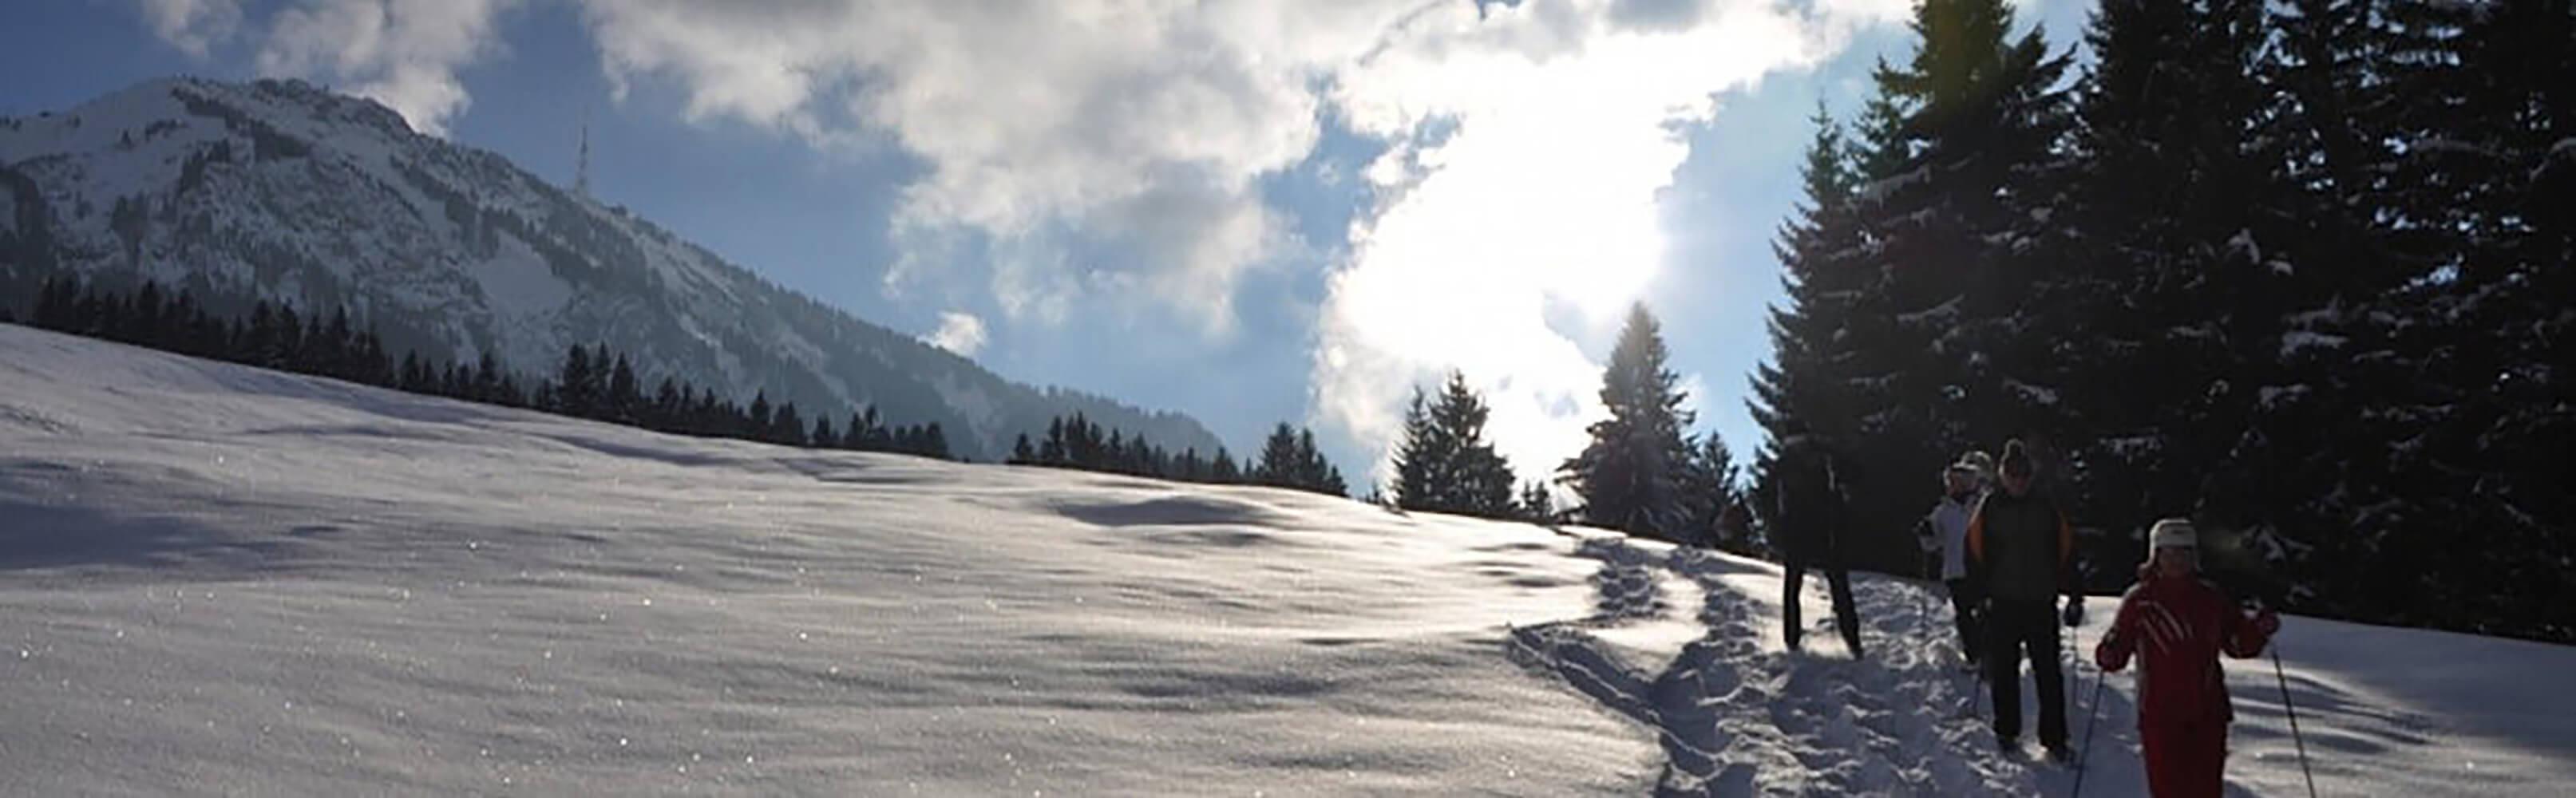 Schneeschuhwandern in Bayern 1